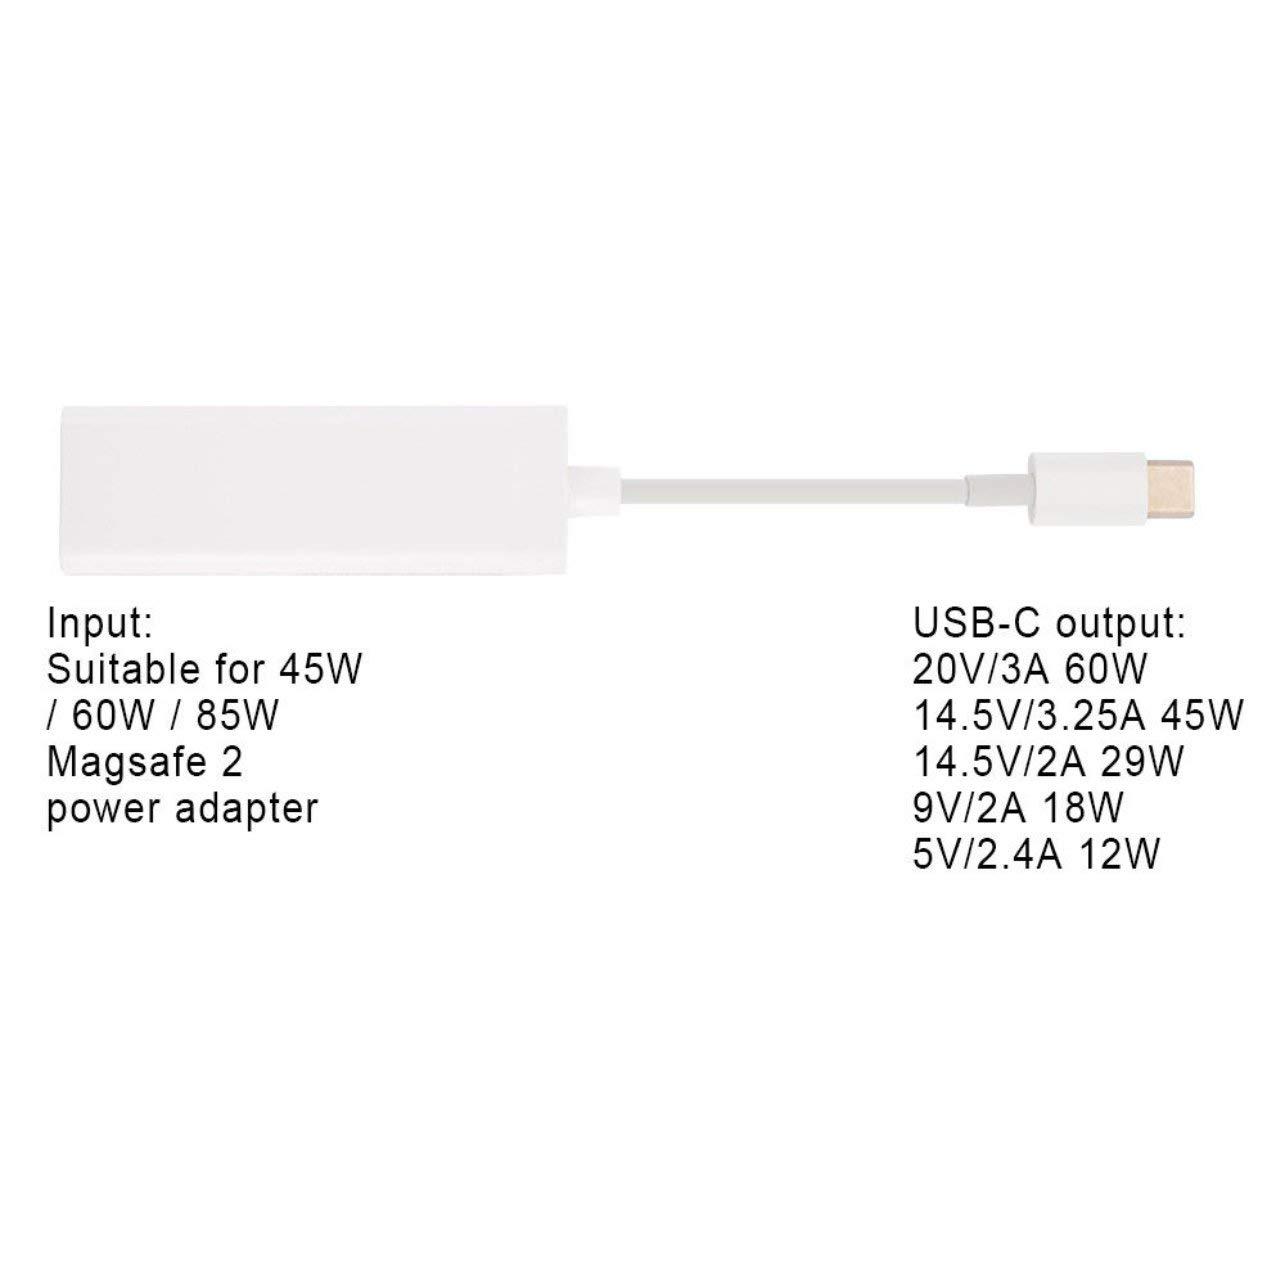 WOSOSYEYO Exquisitamente dise/ñado Elecjet Anywatt 2.0 USB C Adaptador Magsafe Tipo C a Magsafe 1 y 2 Adaptador convertidor de Carga